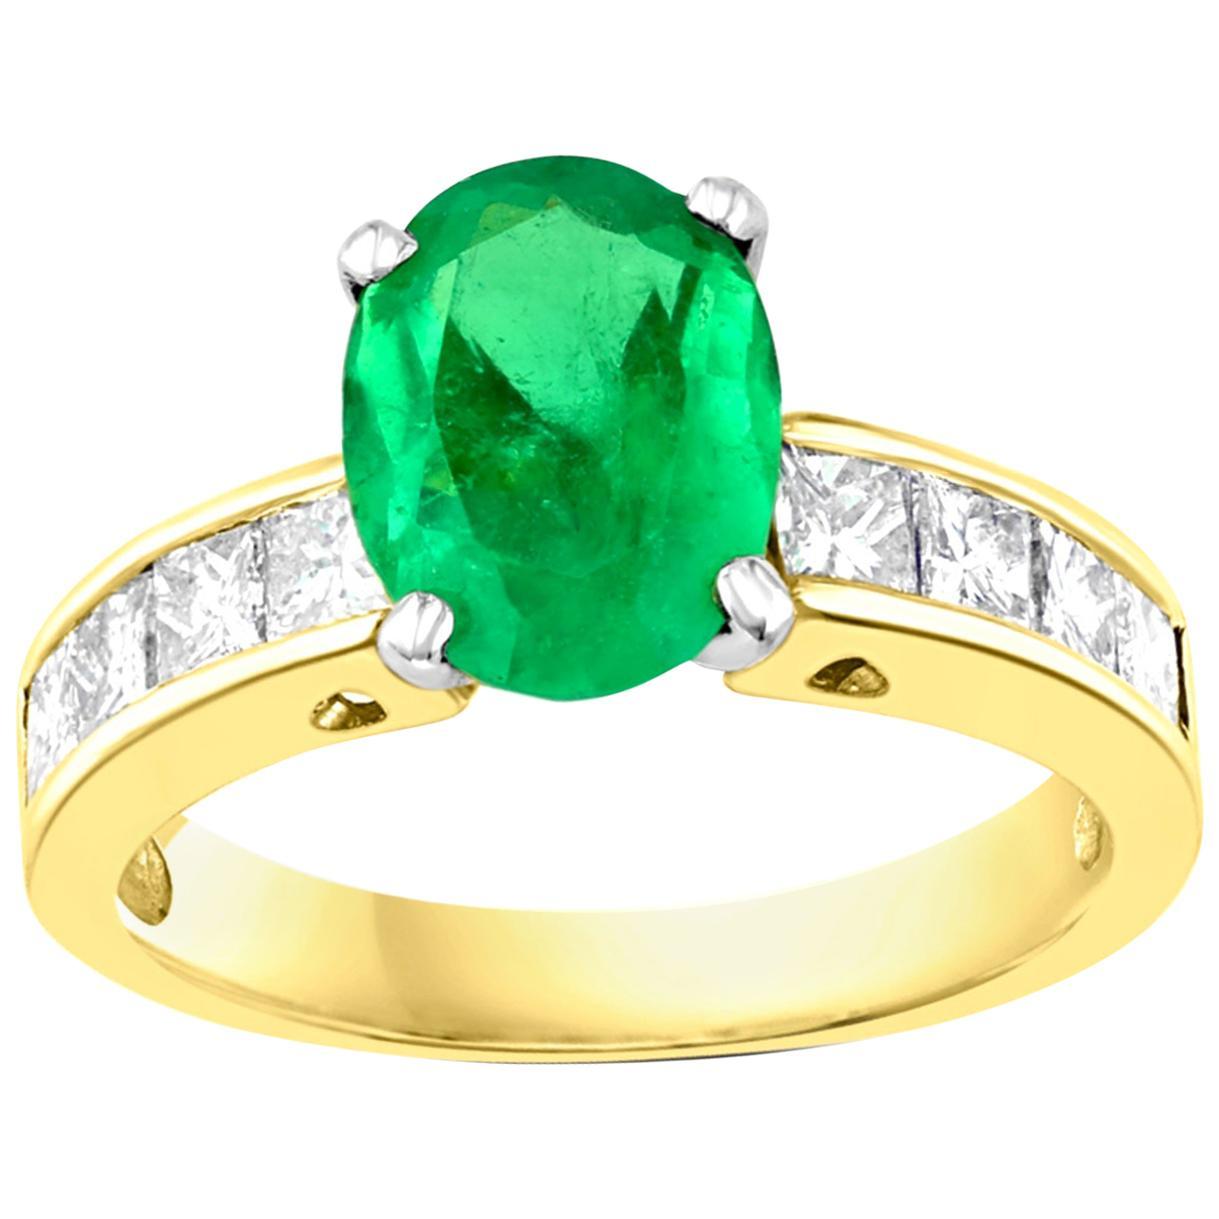 Oval Emerald and Diamond Ring 14 Karat Yellow Gold